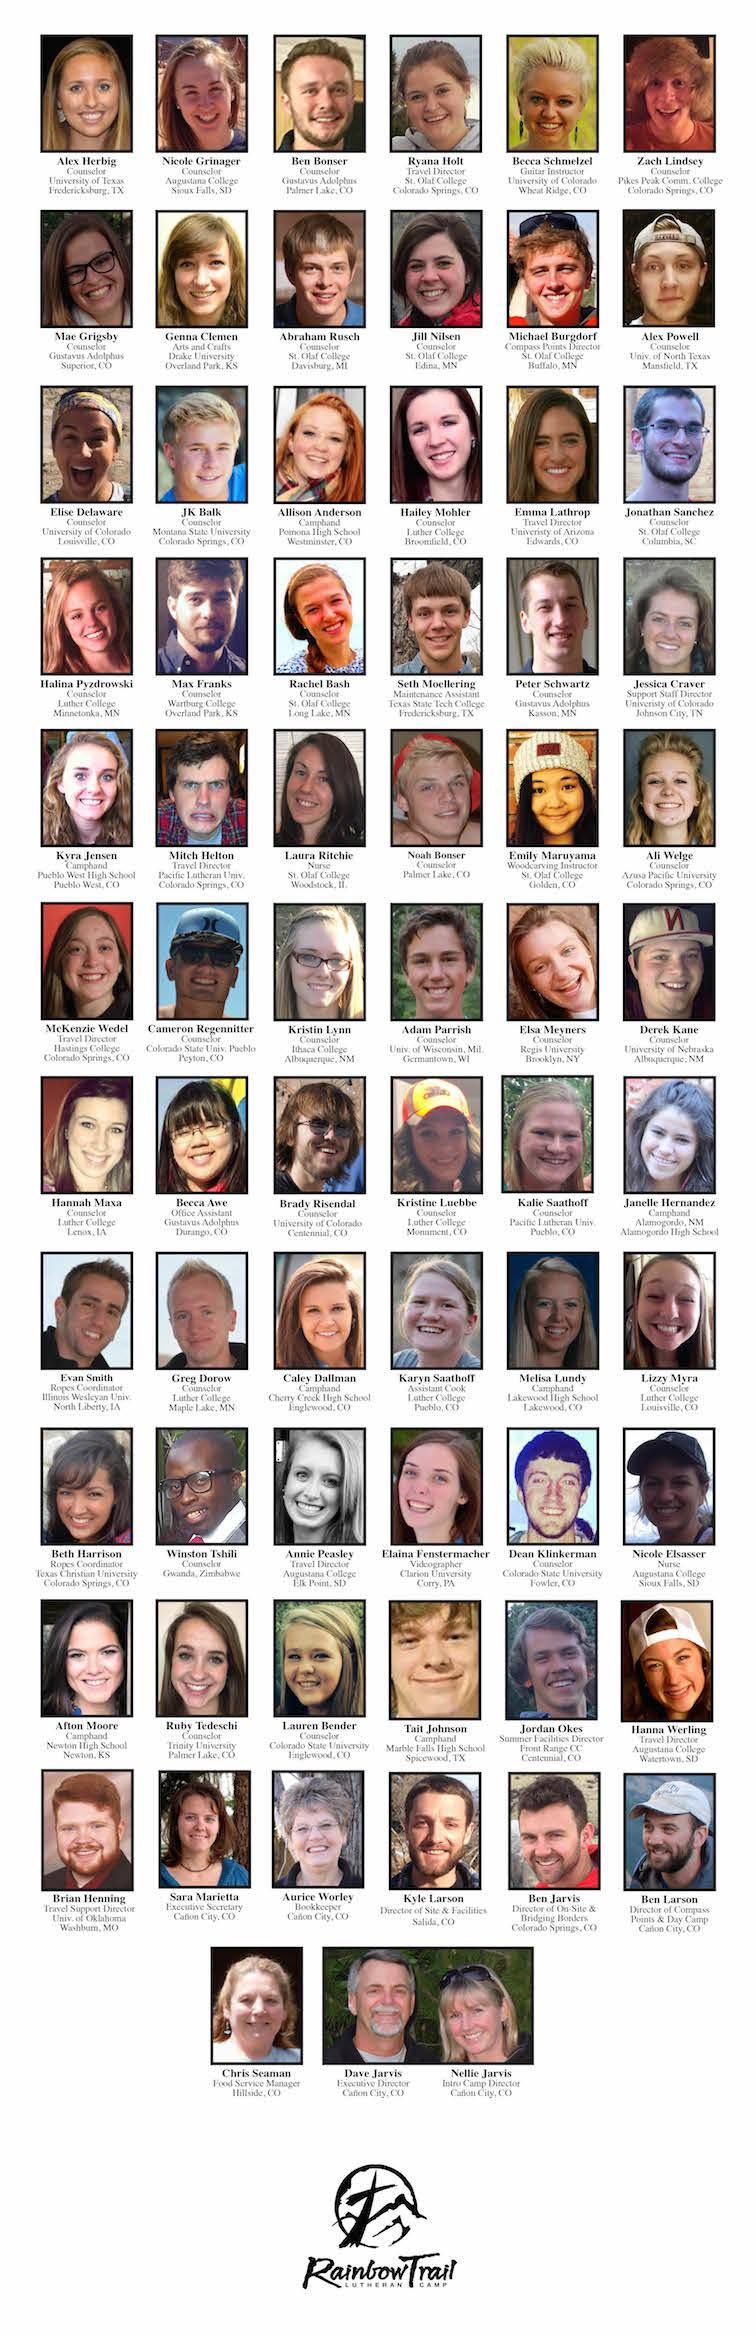 2015 Summer Staff Photos